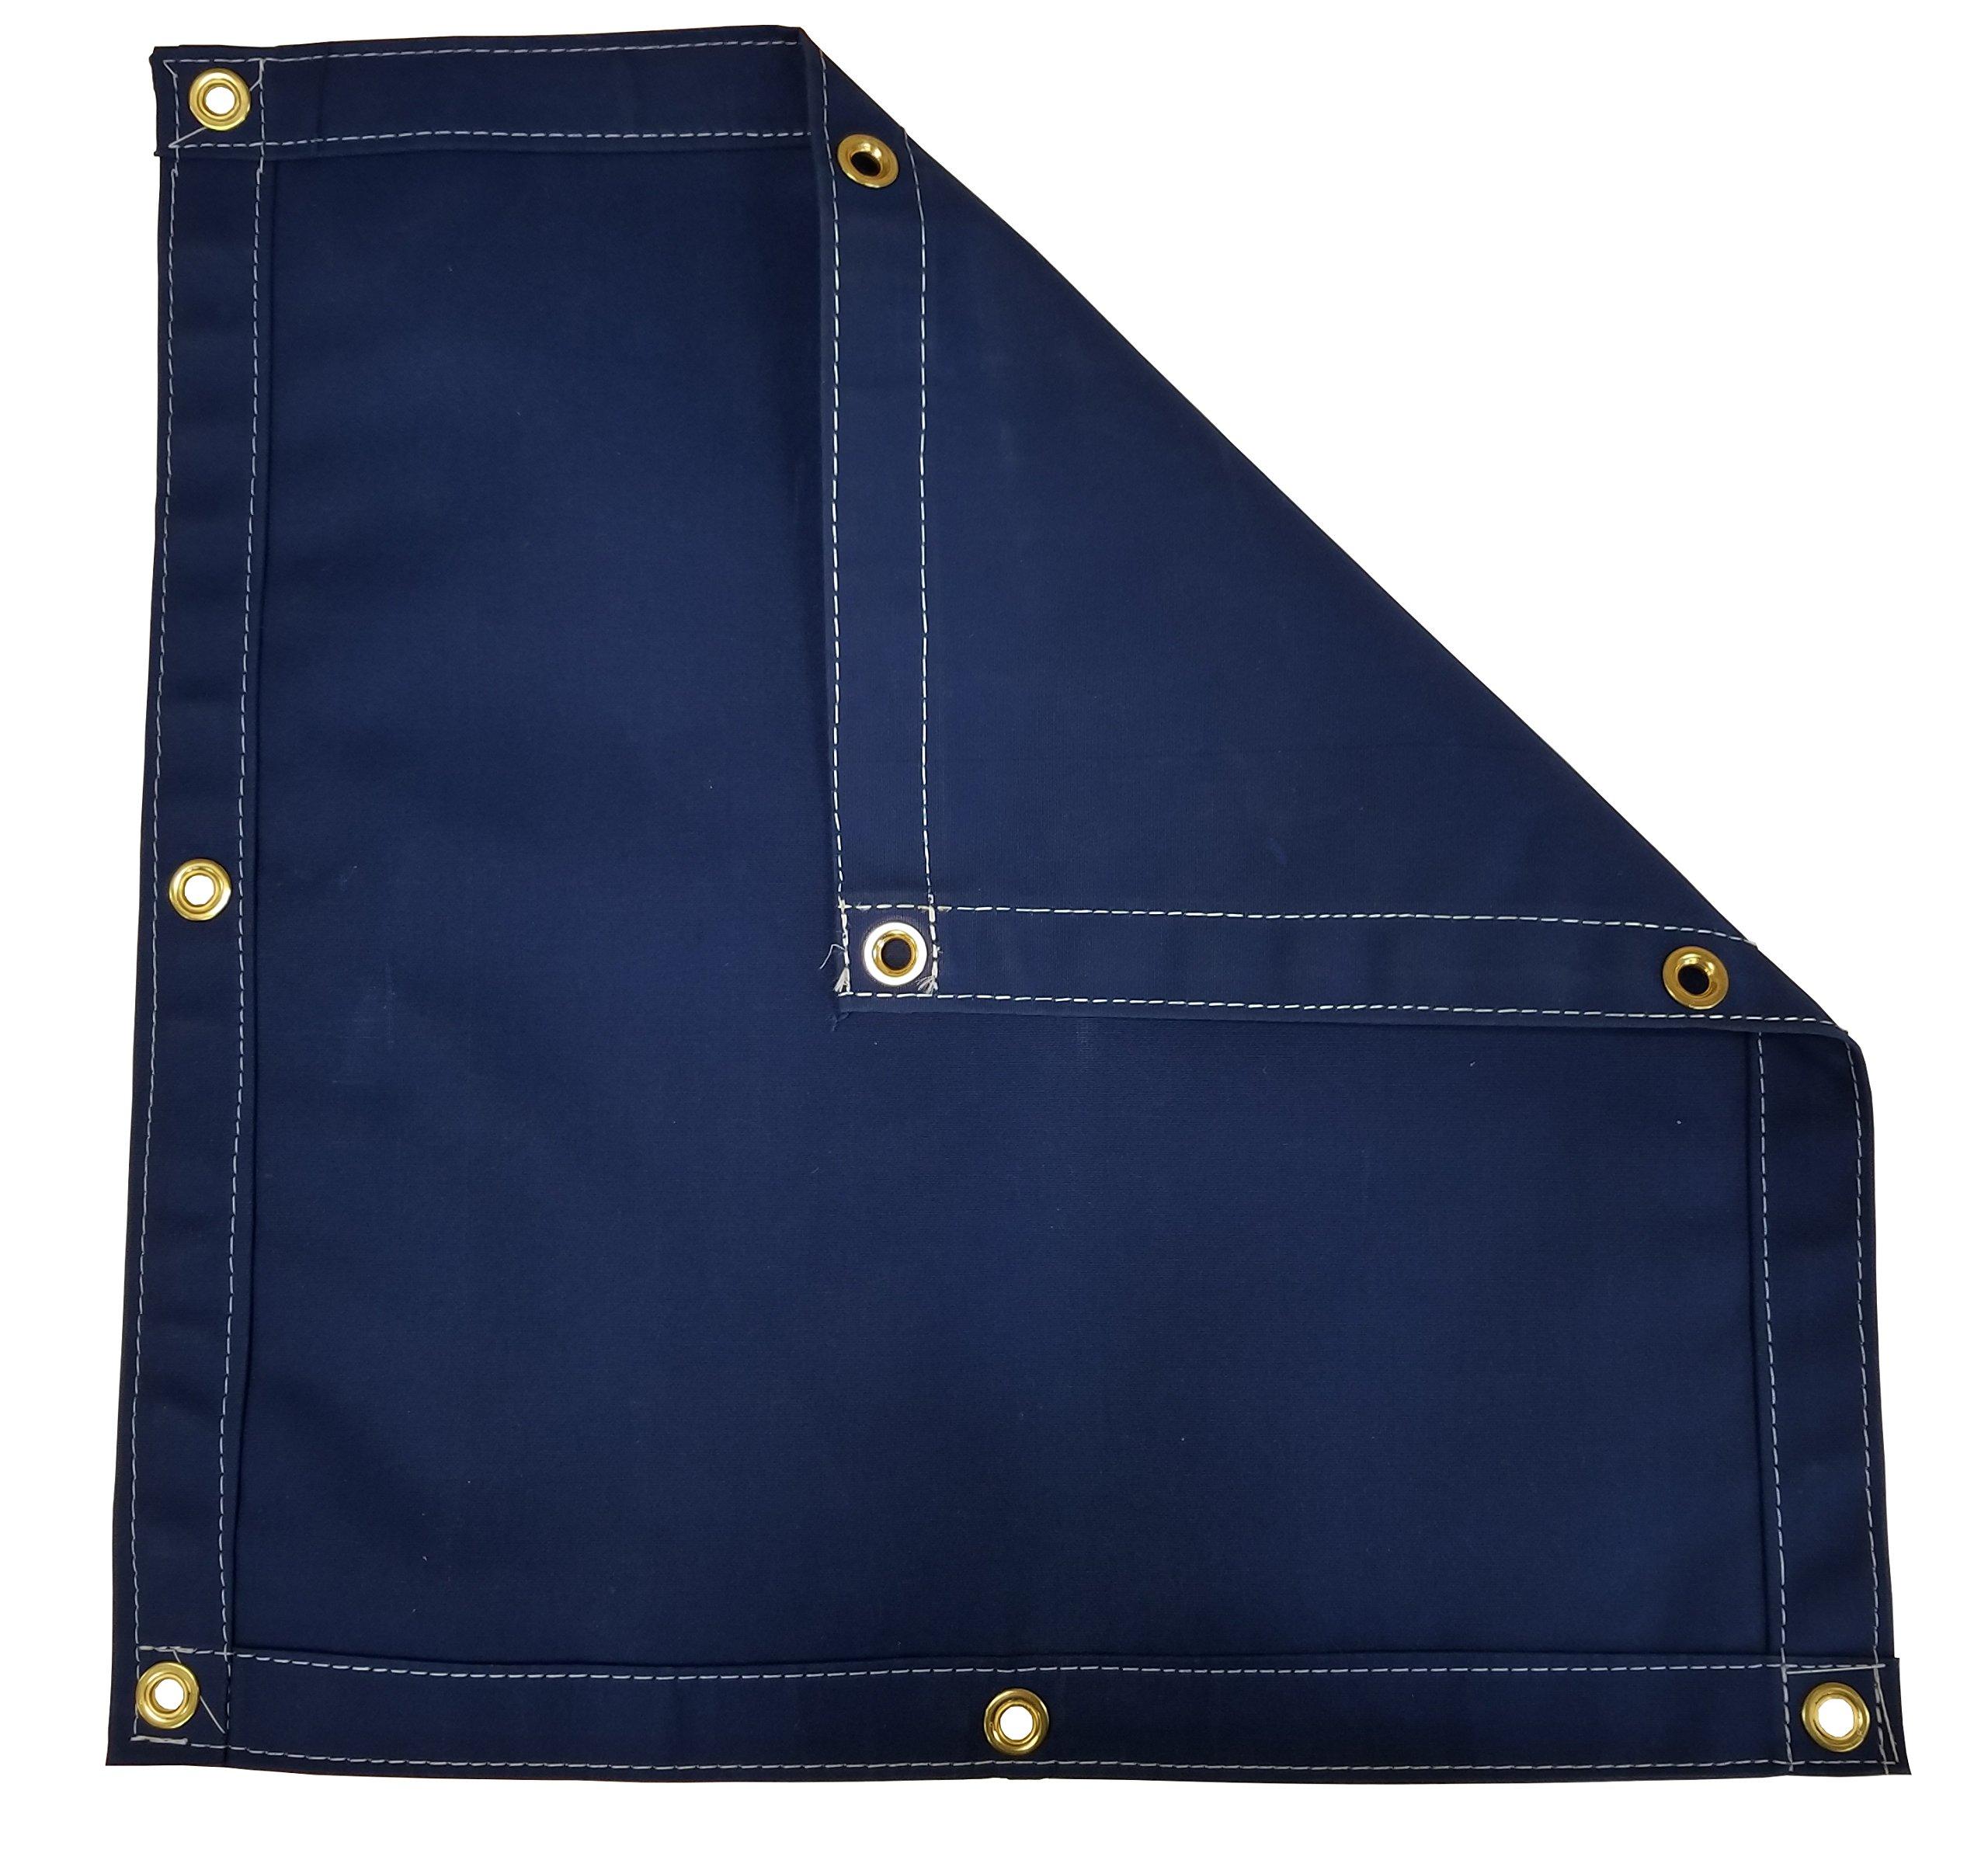 Blue Workhorse Polyester Canvas Tarp 5 Ft. x 7 Ft. - 14.5 Oz.